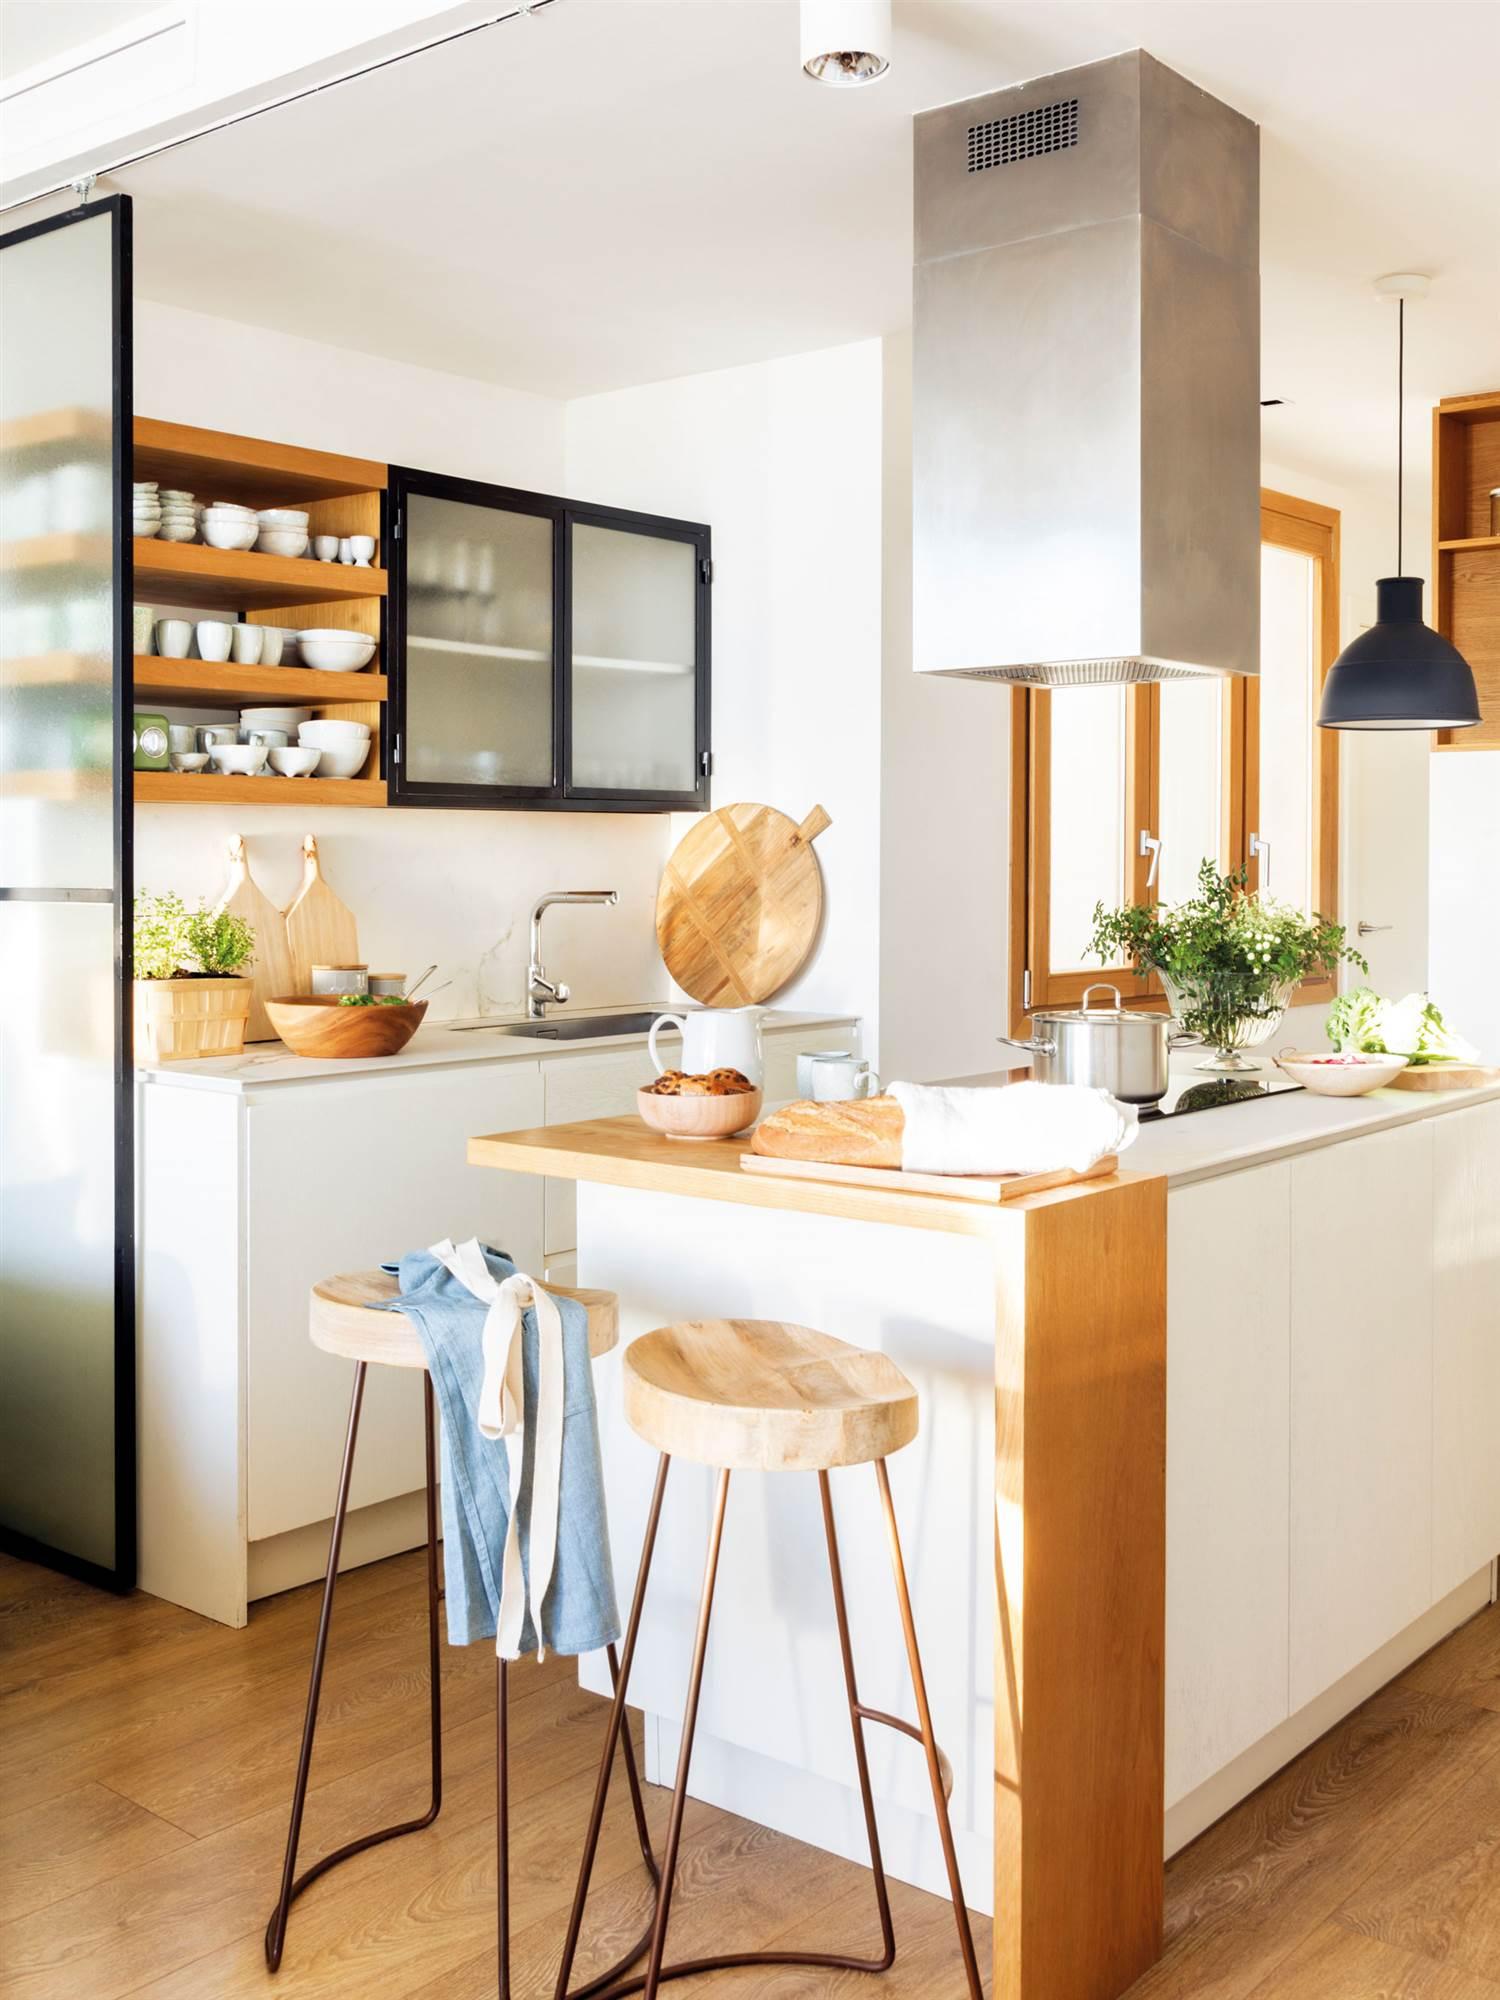 2147 fotos de cocinas for Muebles de madera para cocina pequena